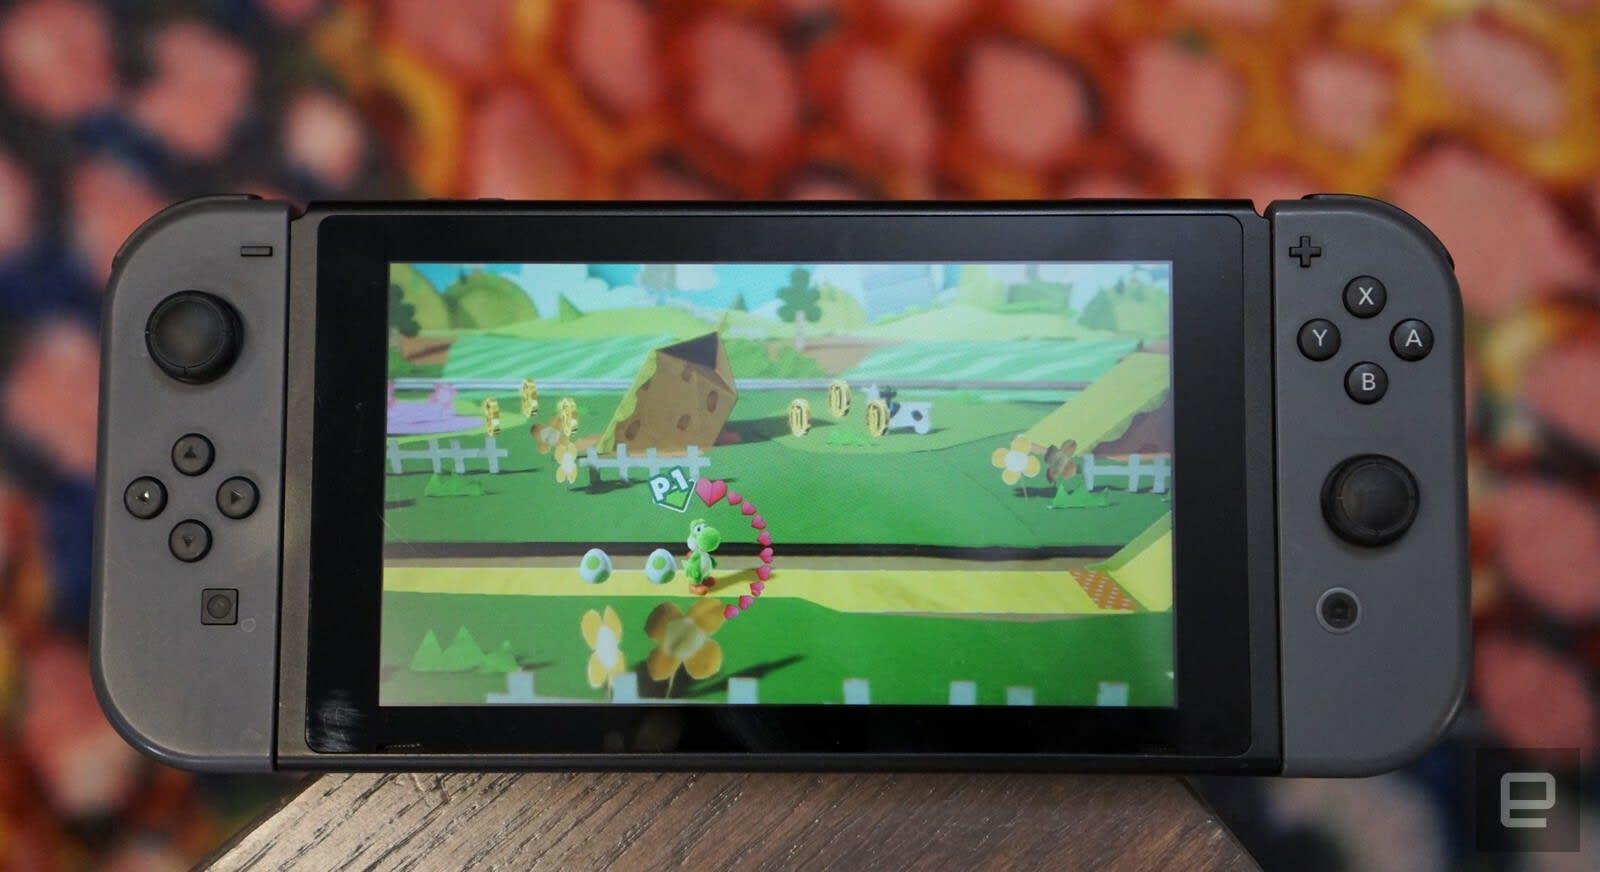 Gaming on Nintendo Switch